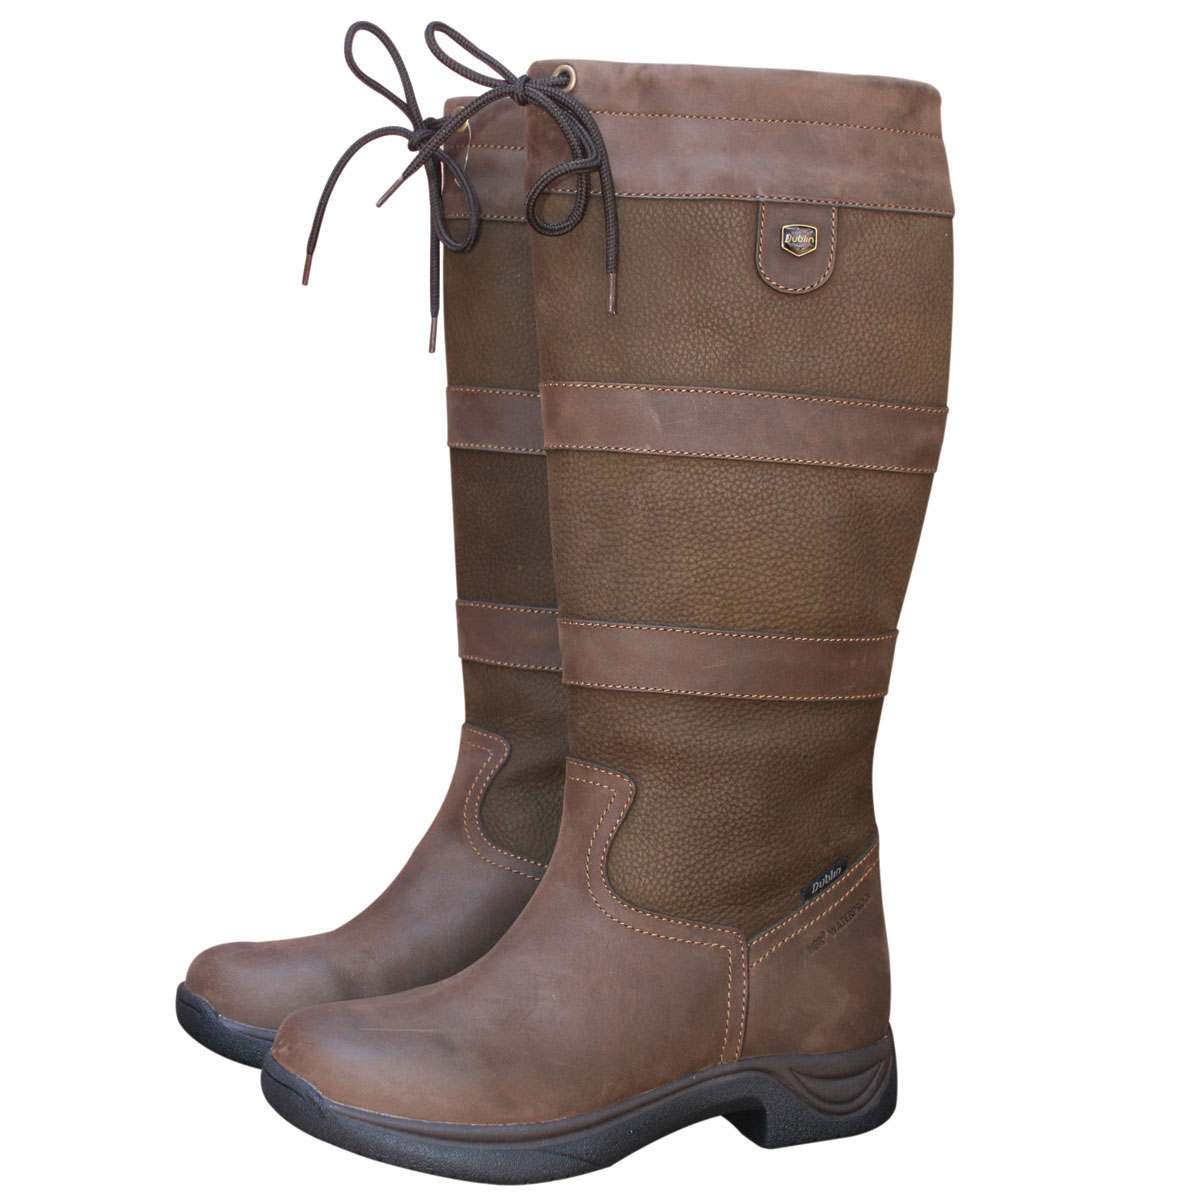 96bdce30957 Dublin Wide Calf River Boots